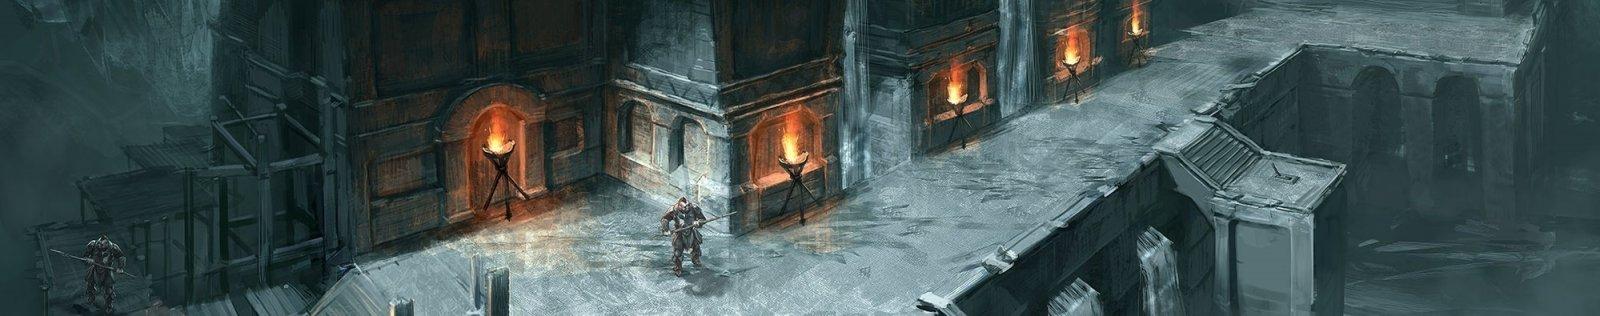 站在巨人肩膀上的 RPG -《Realms Beyond: Ashes of the Fallen》